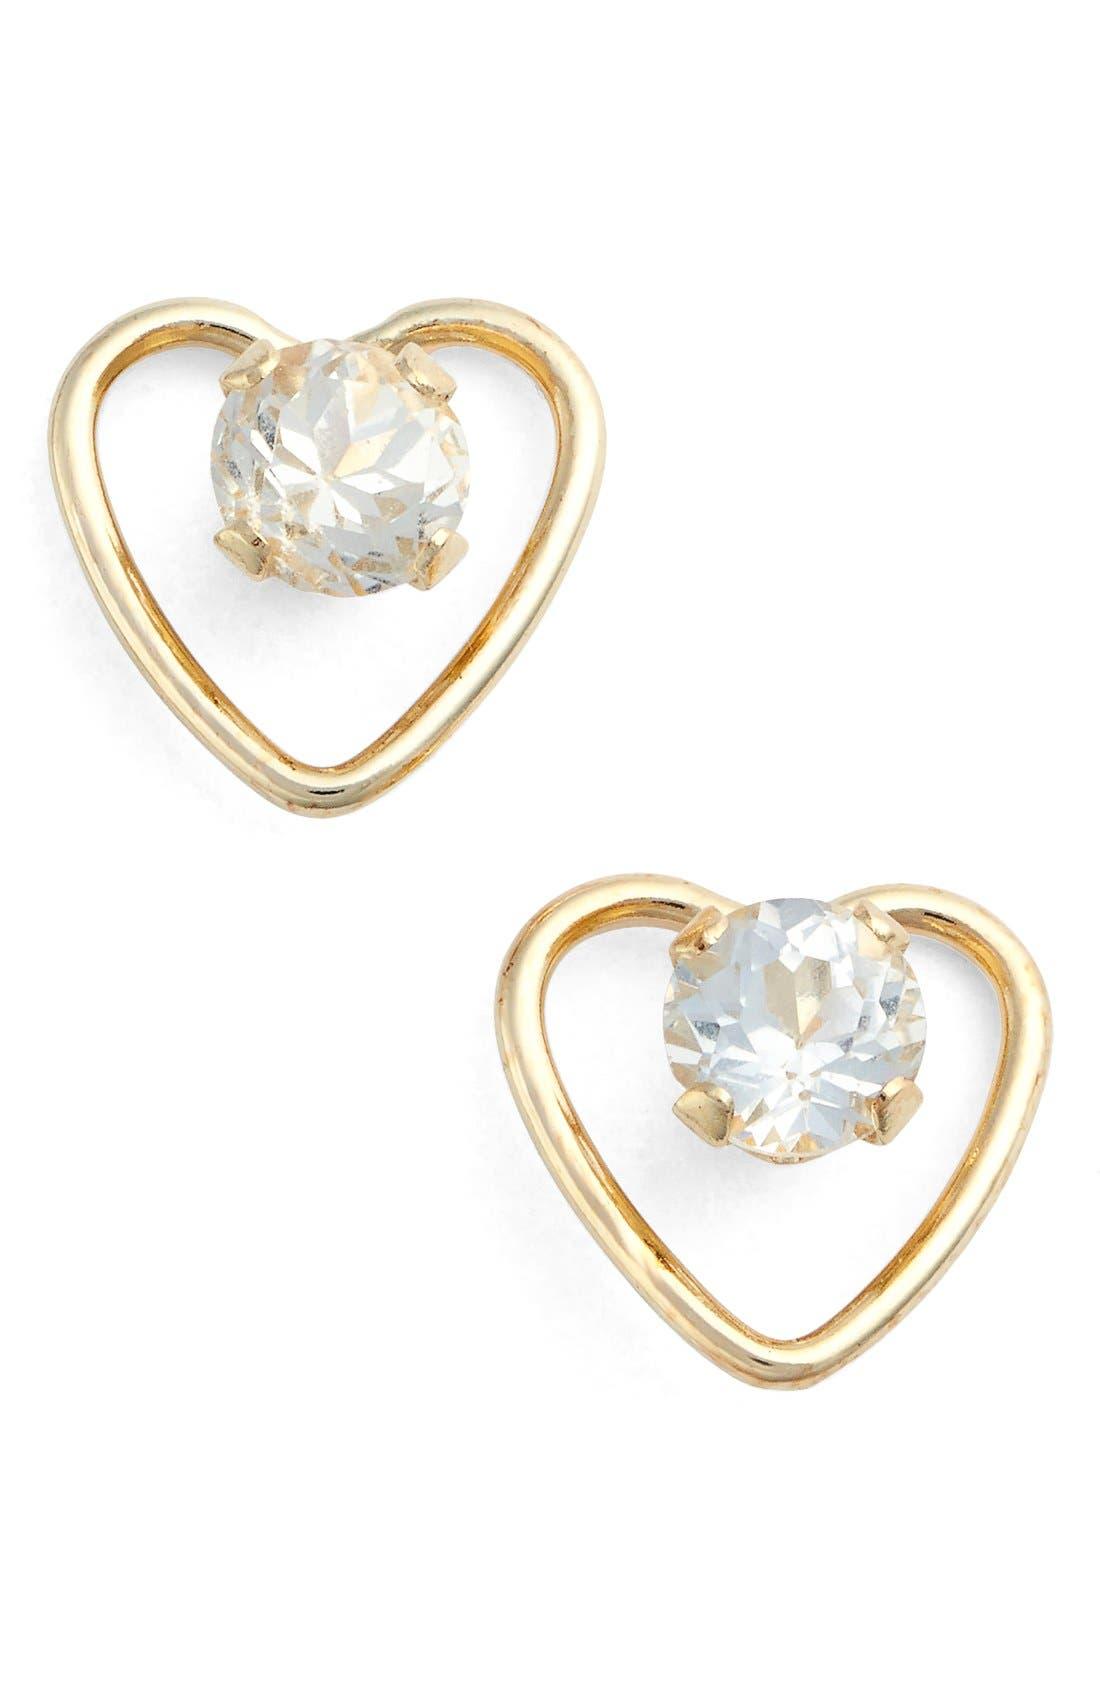 Cubic Zirconia Heart Earrings,                             Main thumbnail 1, color,                             YELLOW GOLD